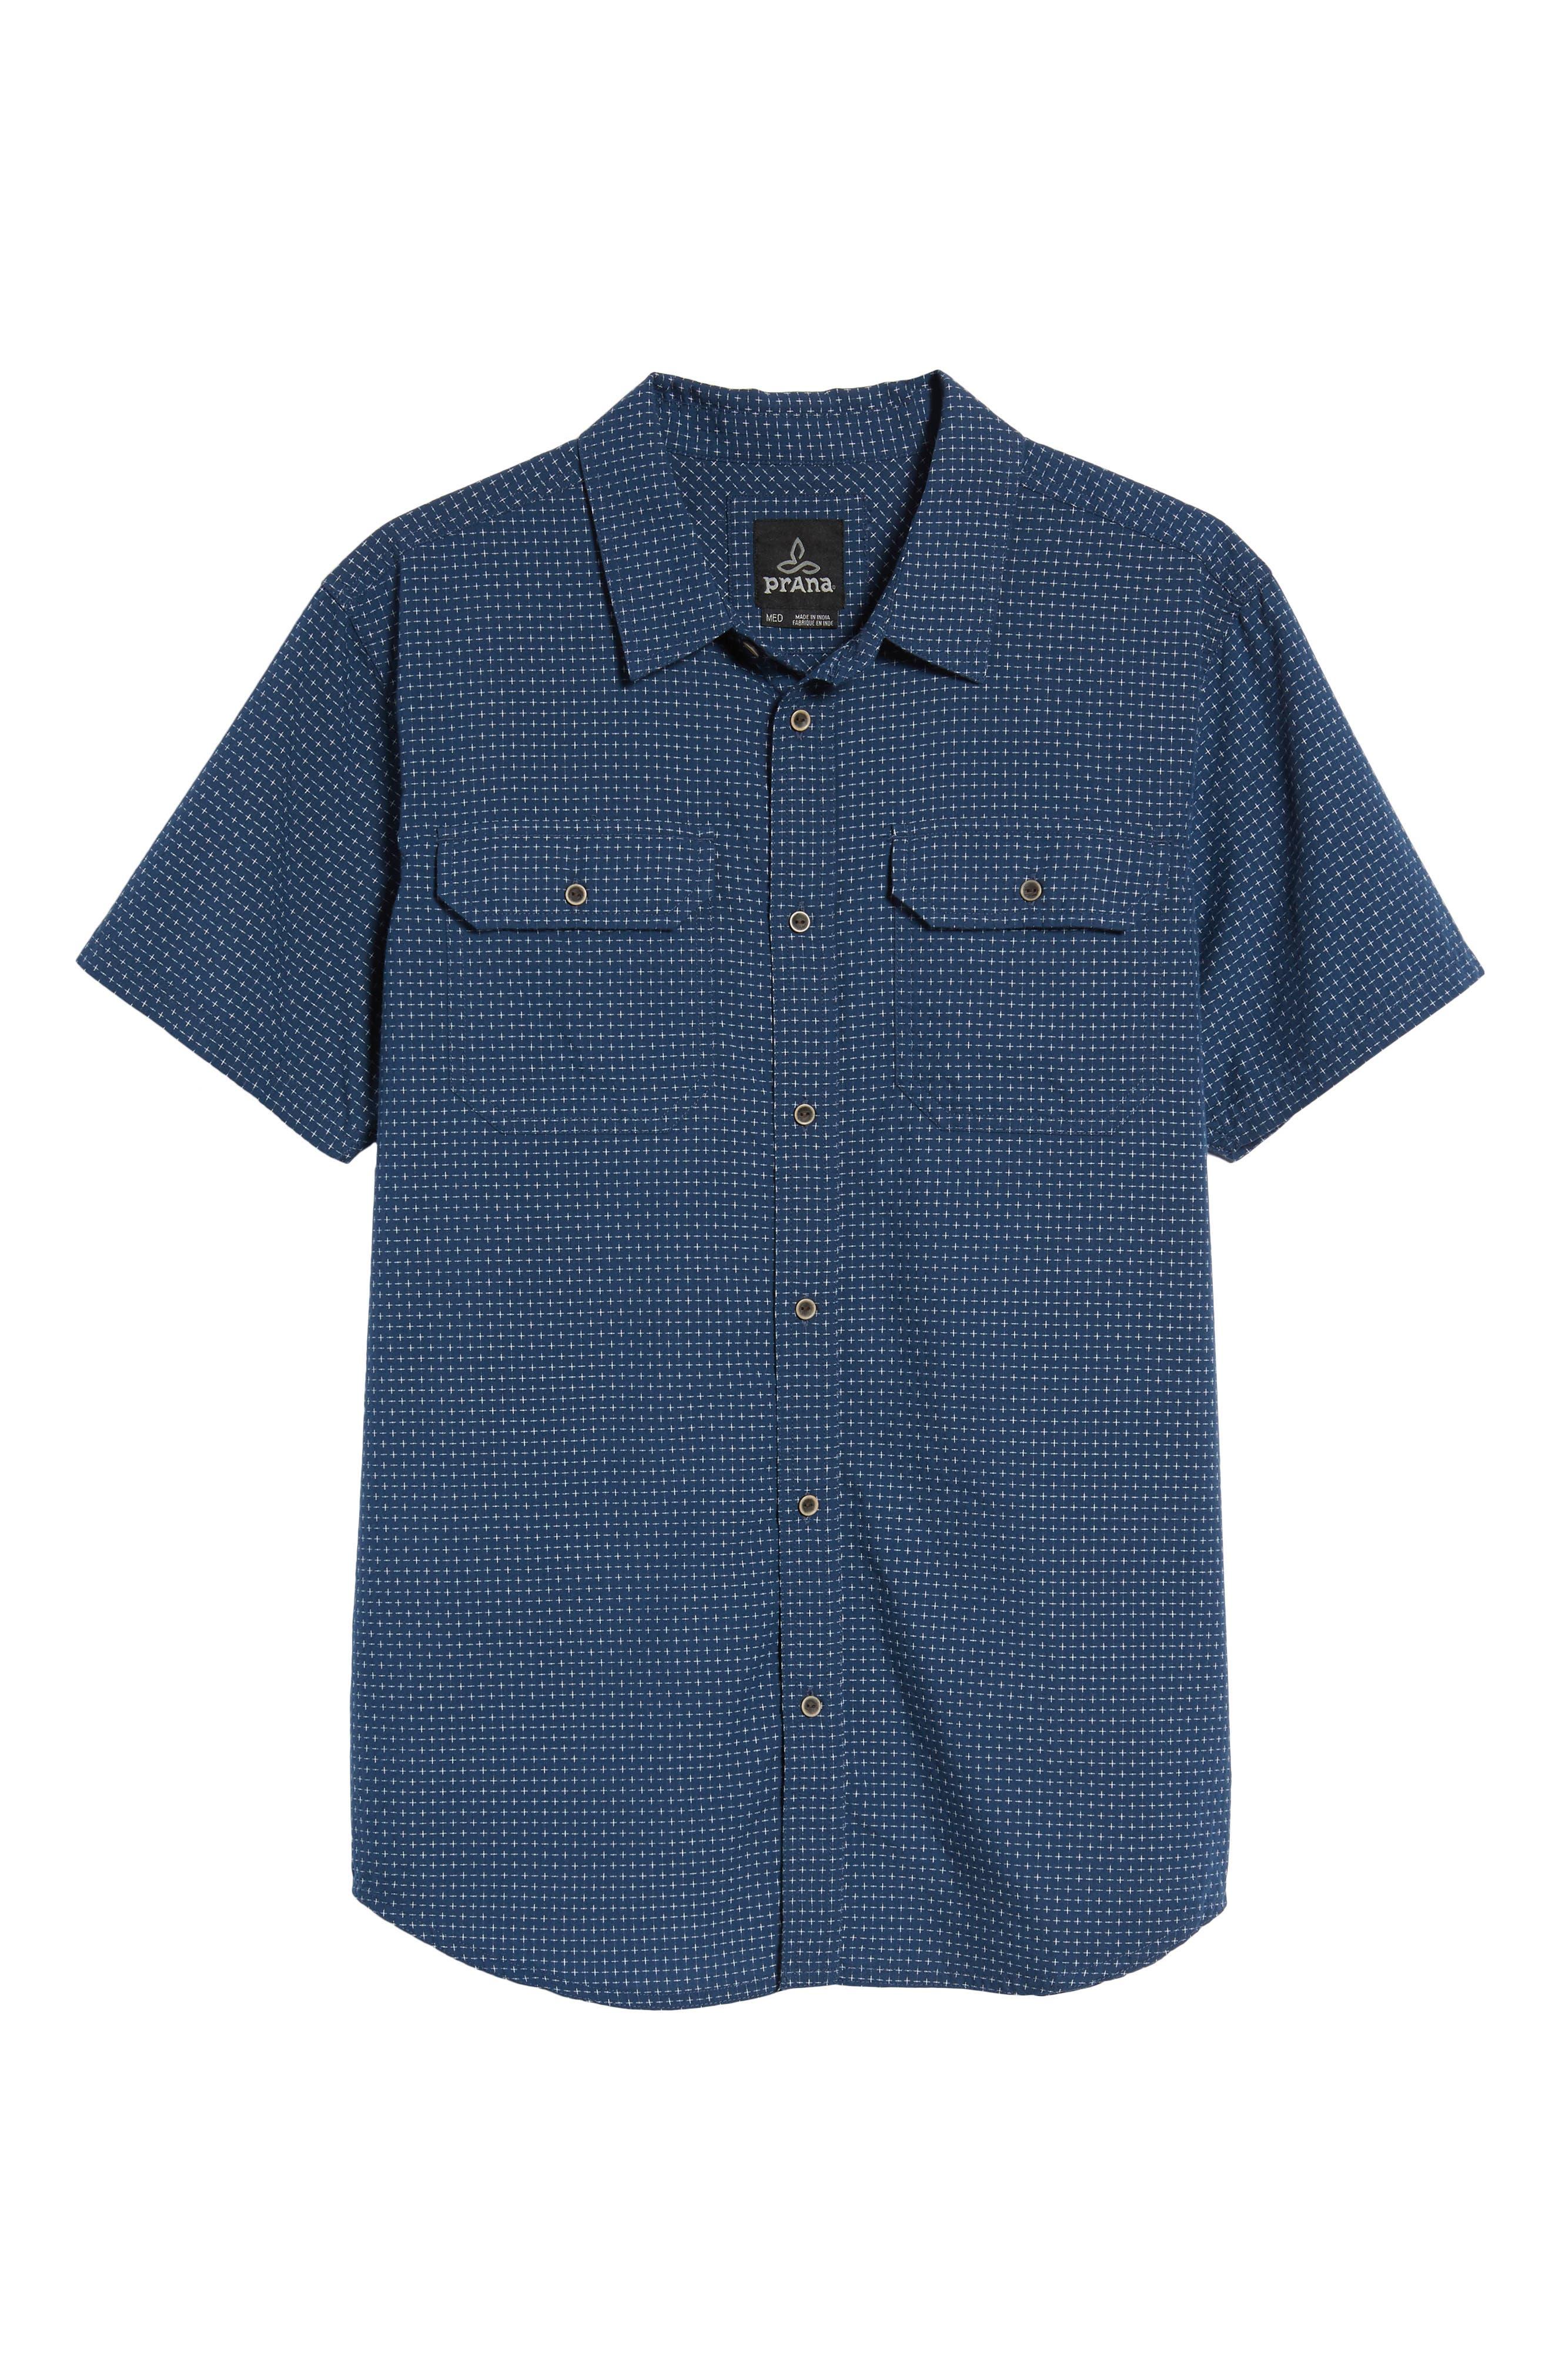 Blakely Slim Fit Short Sleeve Sport Shirt,                             Alternate thumbnail 12, color,